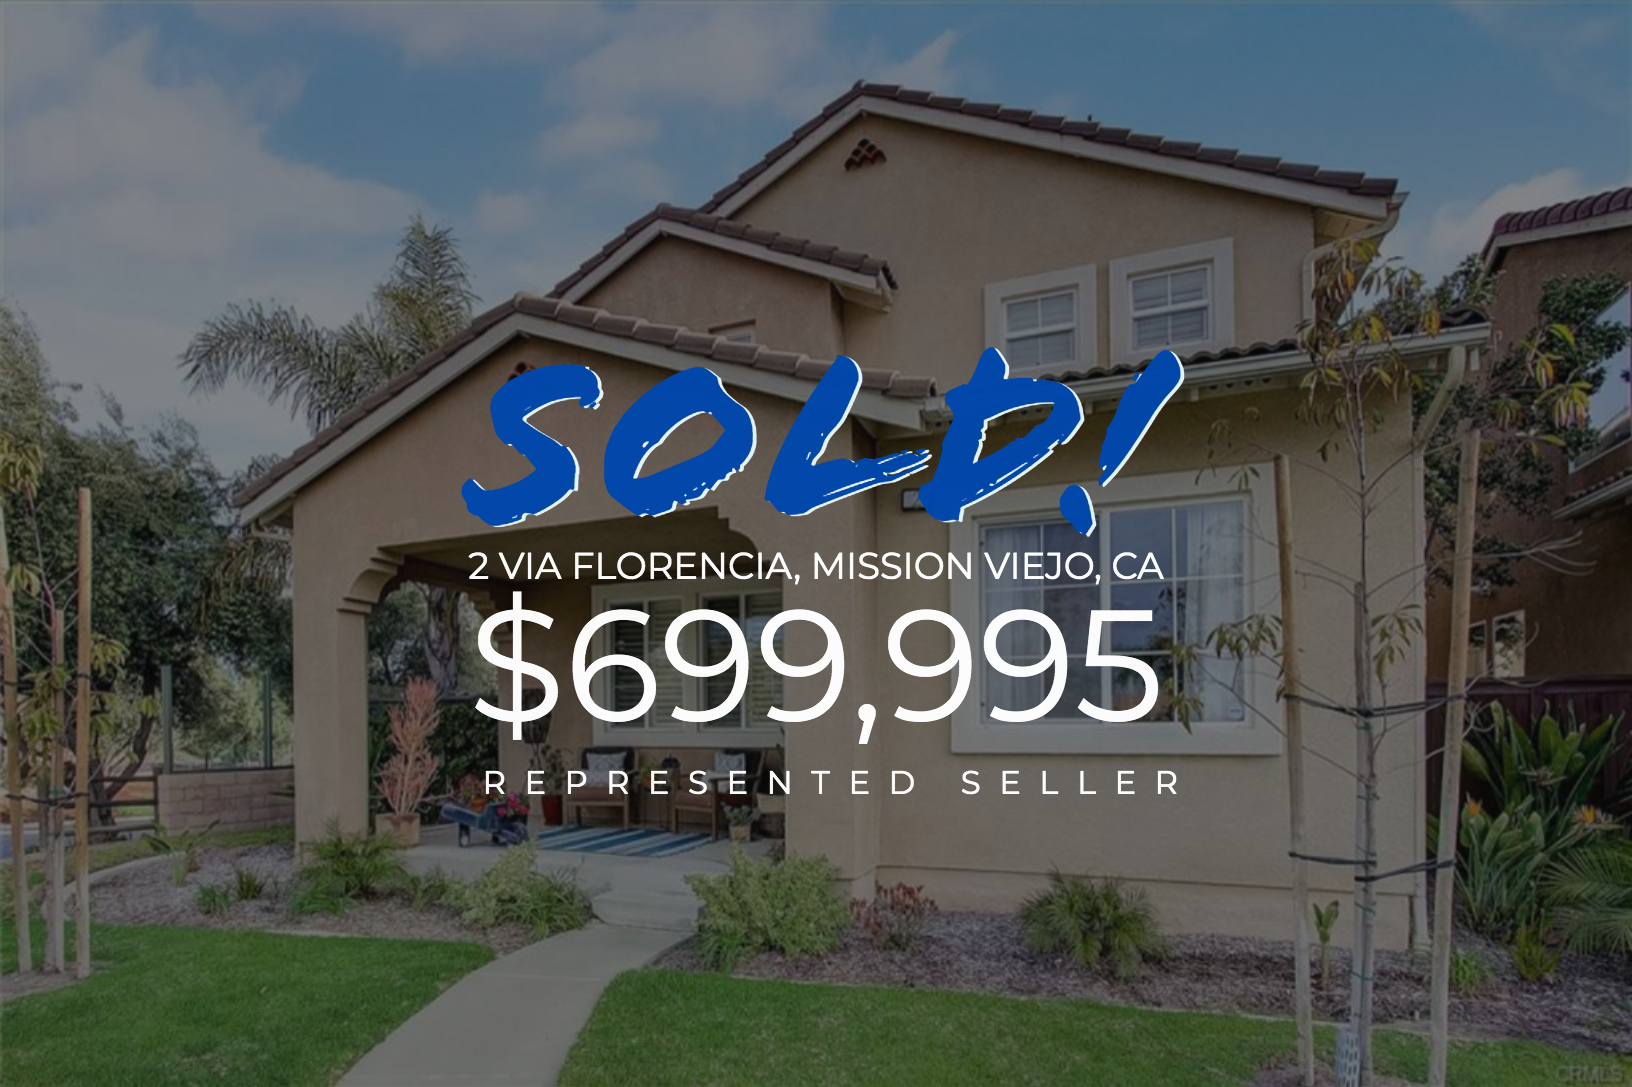 Sold With Matt Blashaw 2 Via Florencia in Mission Viejo, CA